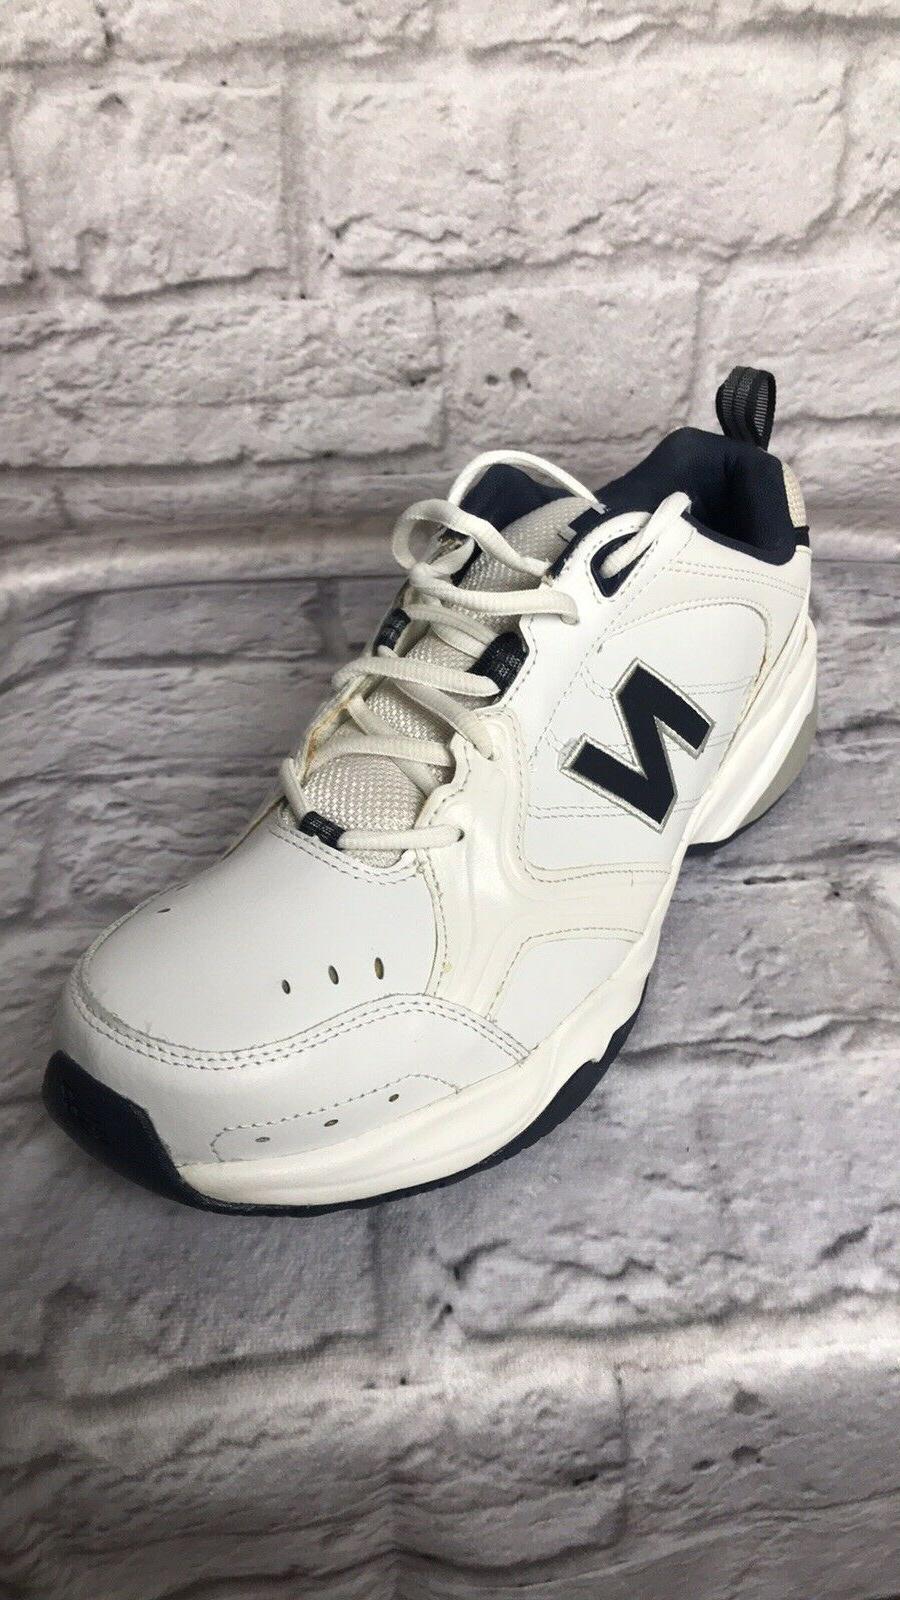 New Balance 624 Shoes Sz Mens NWOB